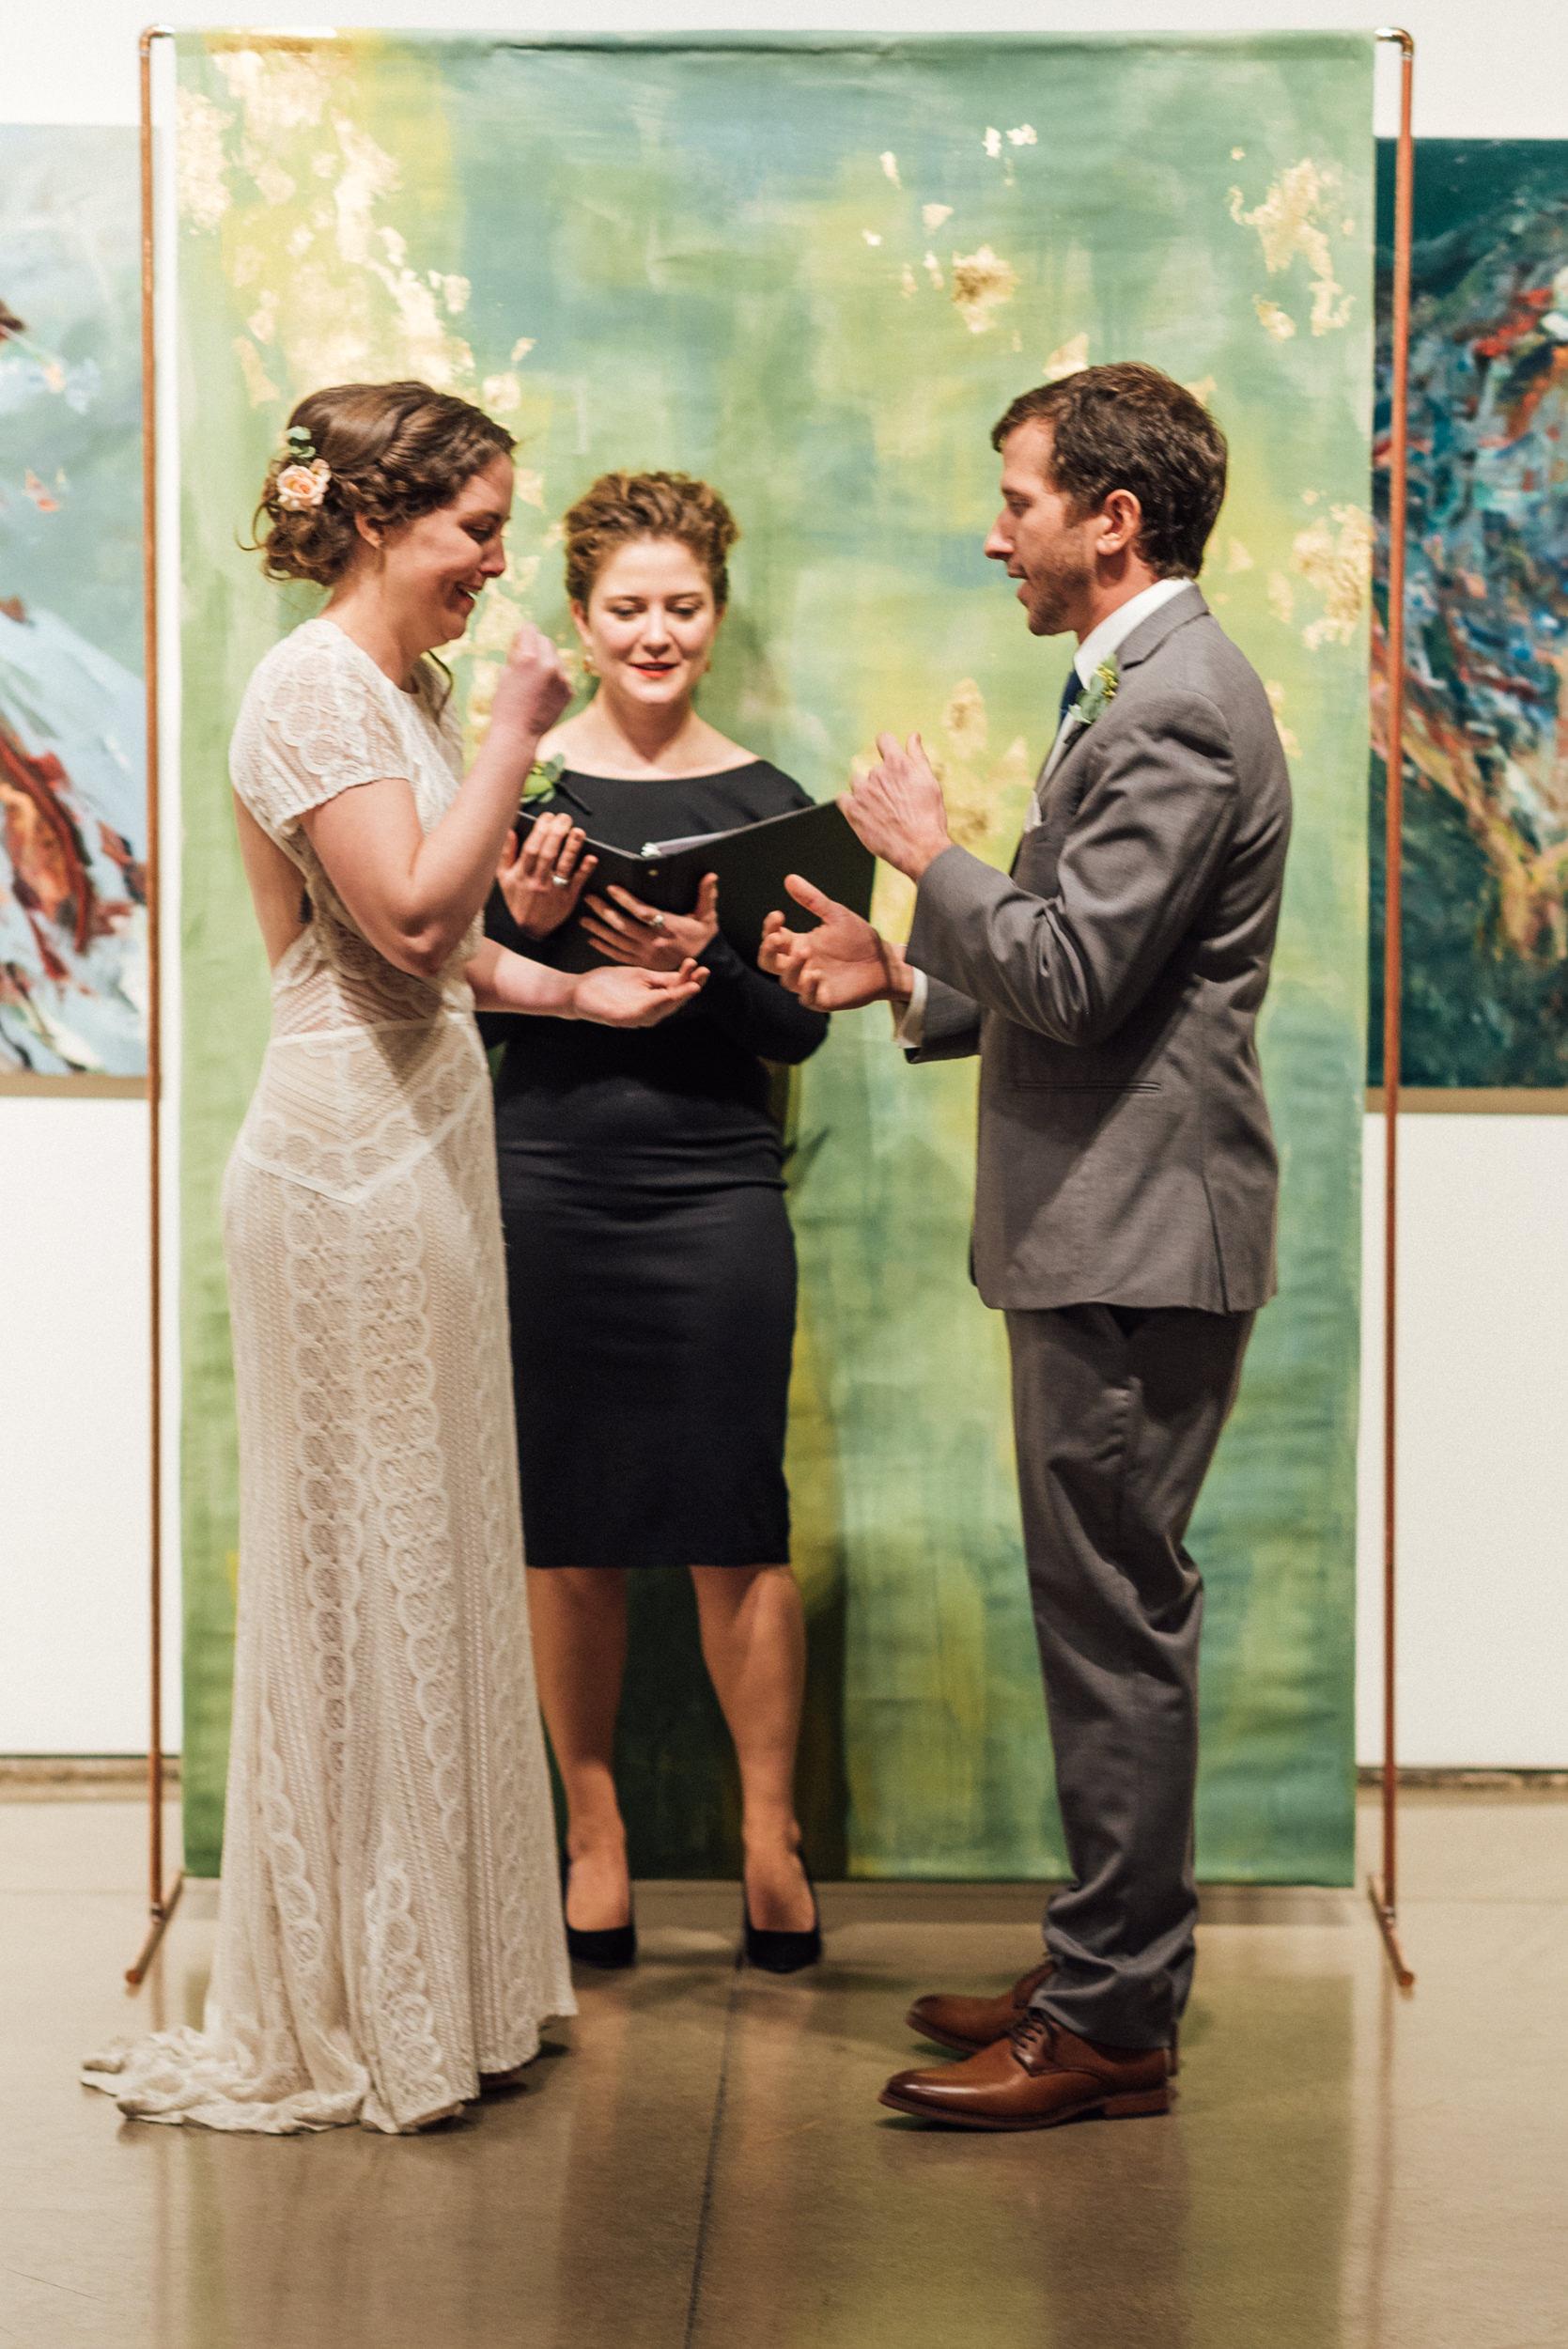 Rock Paper Scissors at Space Gallery for Wedding Vows-Denver, Colorado